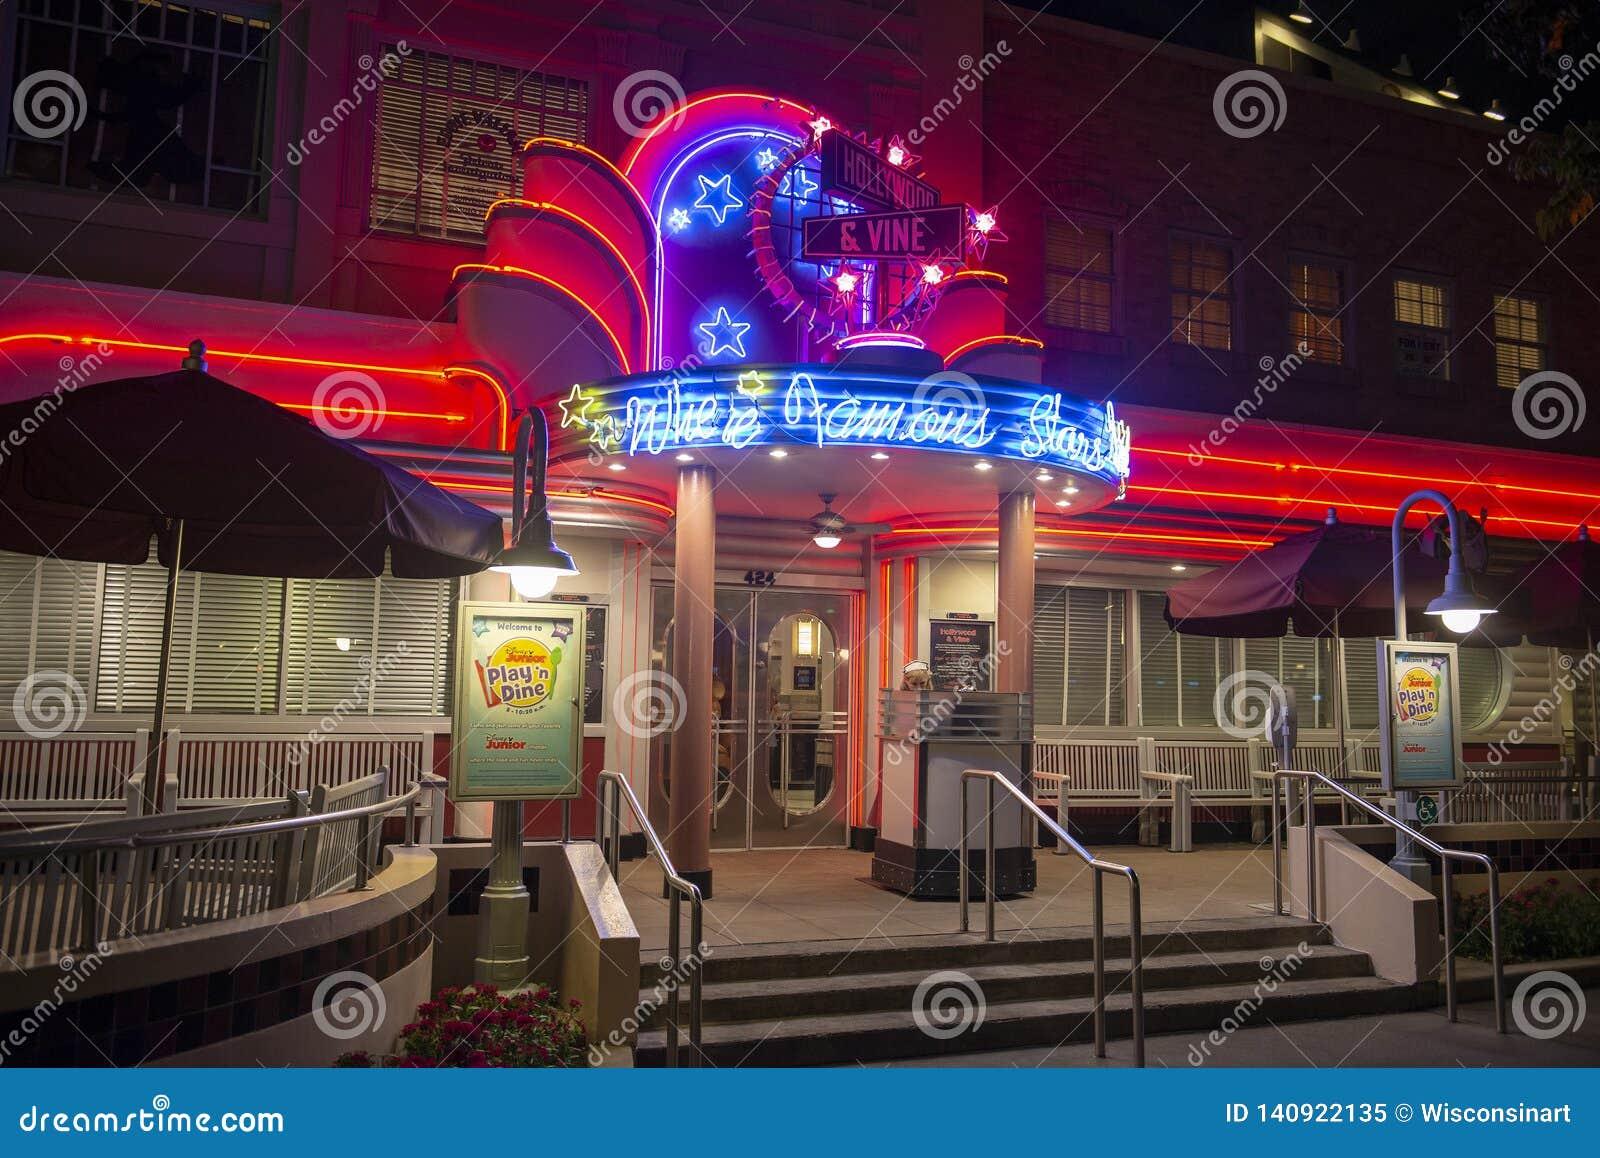 Hollywood Vine Restaurant Disney World Travel Editorial